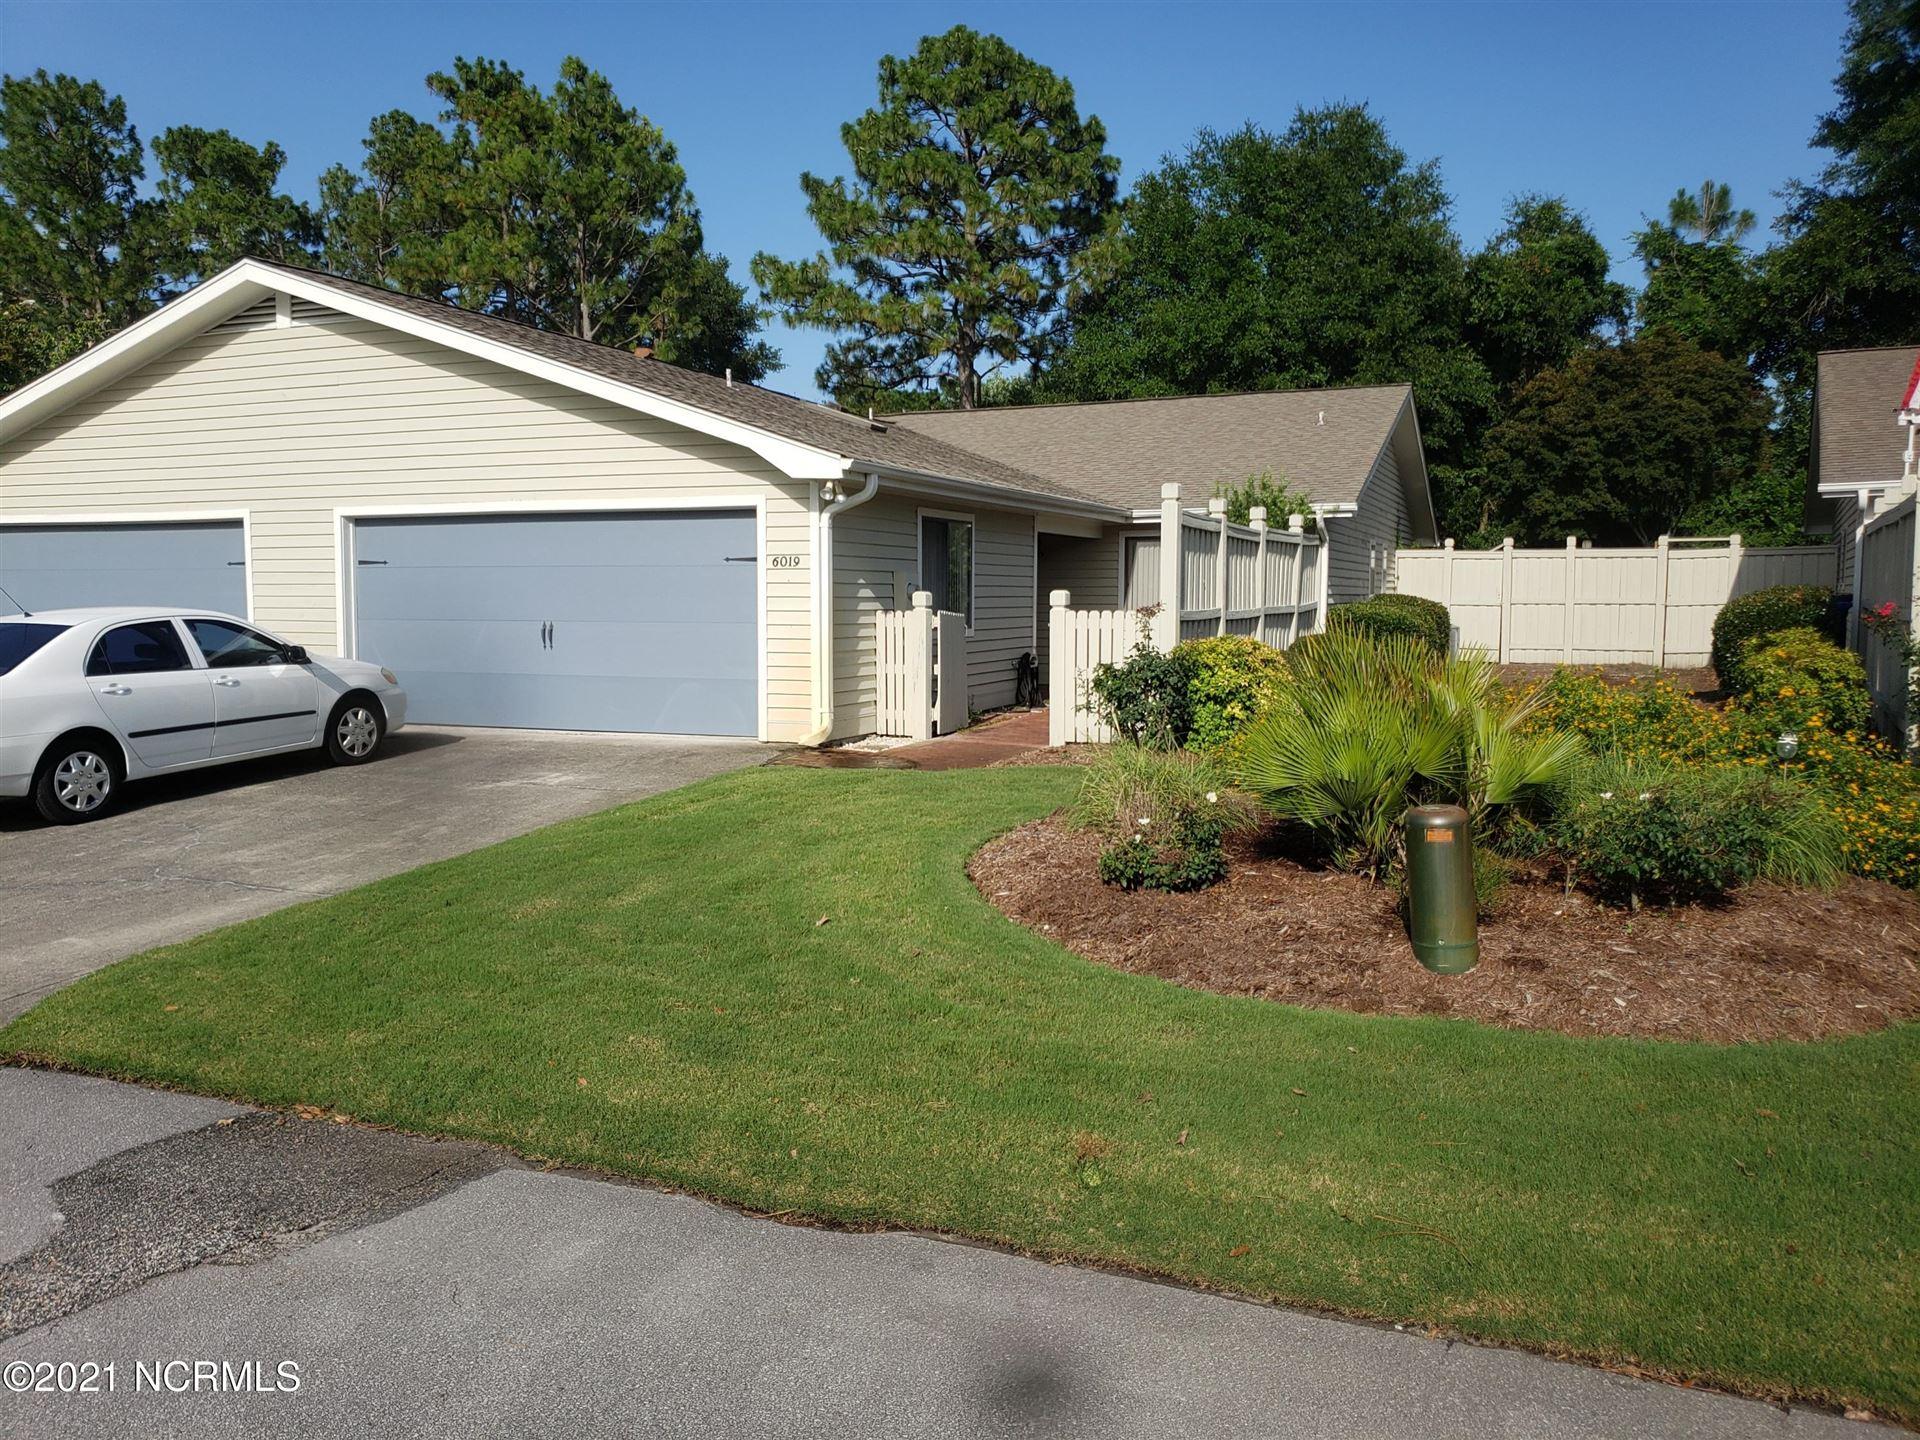 Photo of 6019 Caddy Circle, Wilmington, NC 28405 (MLS # 100282435)